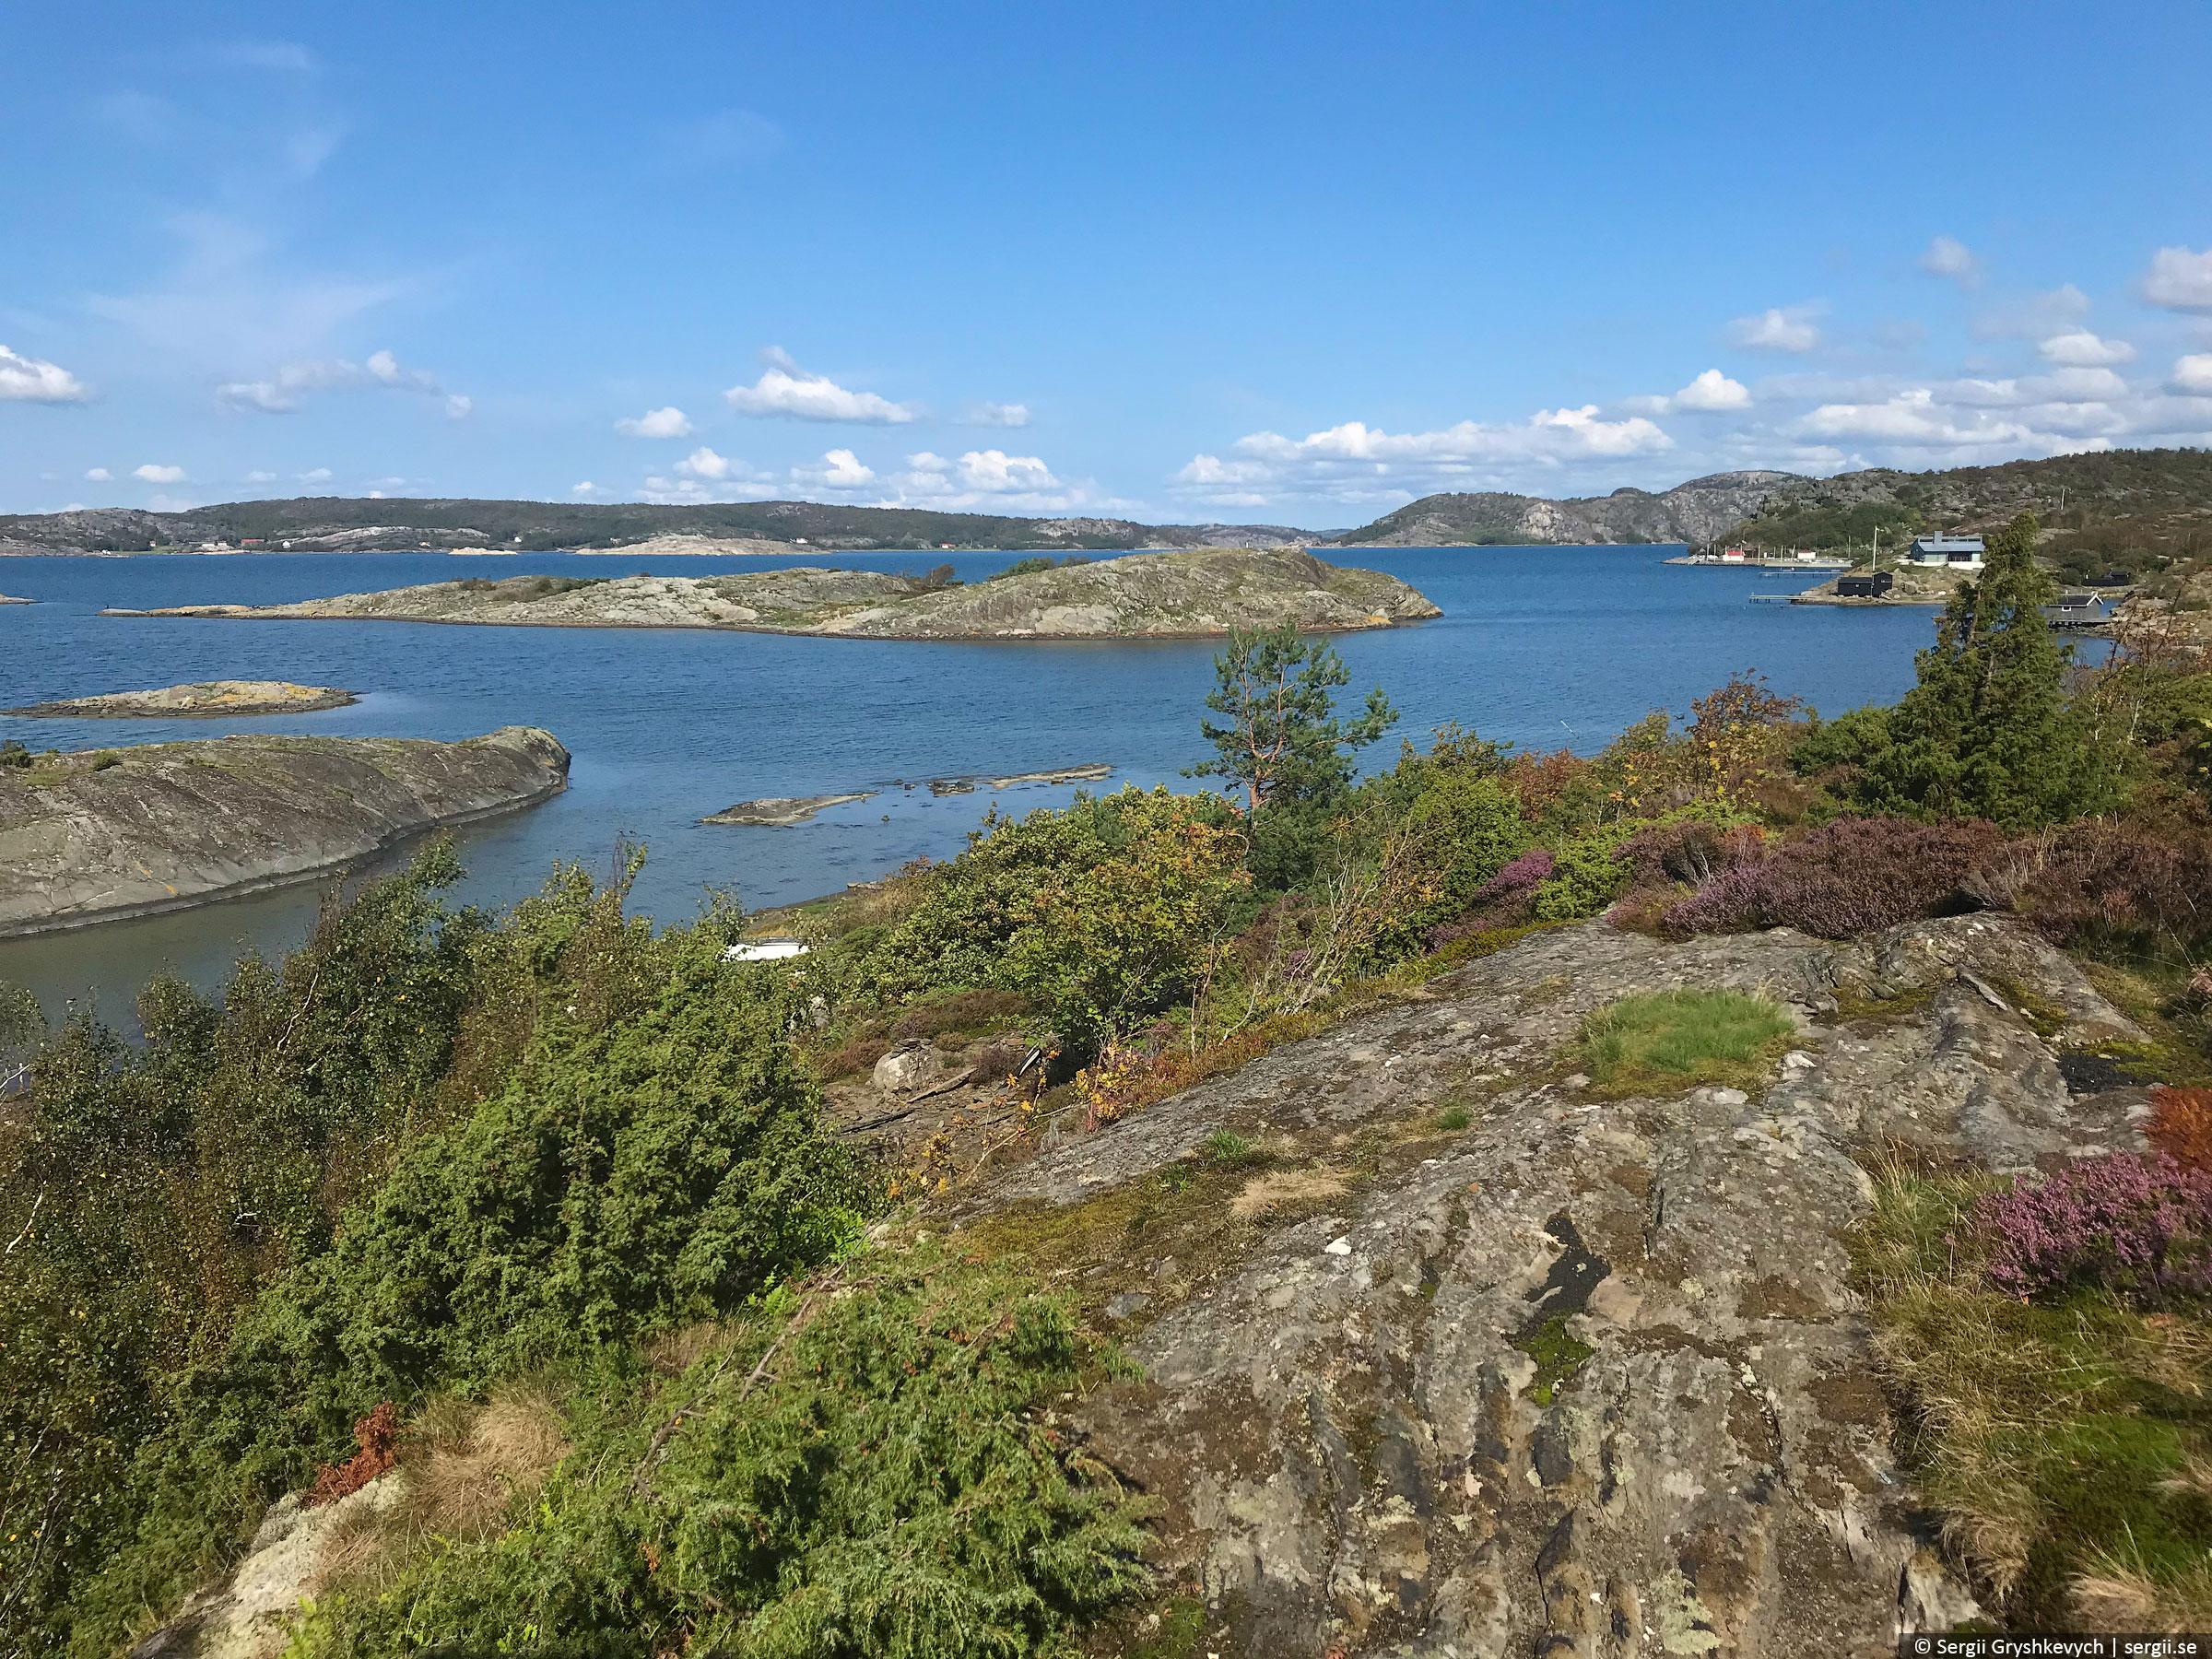 west-coast-sweden-2018-2